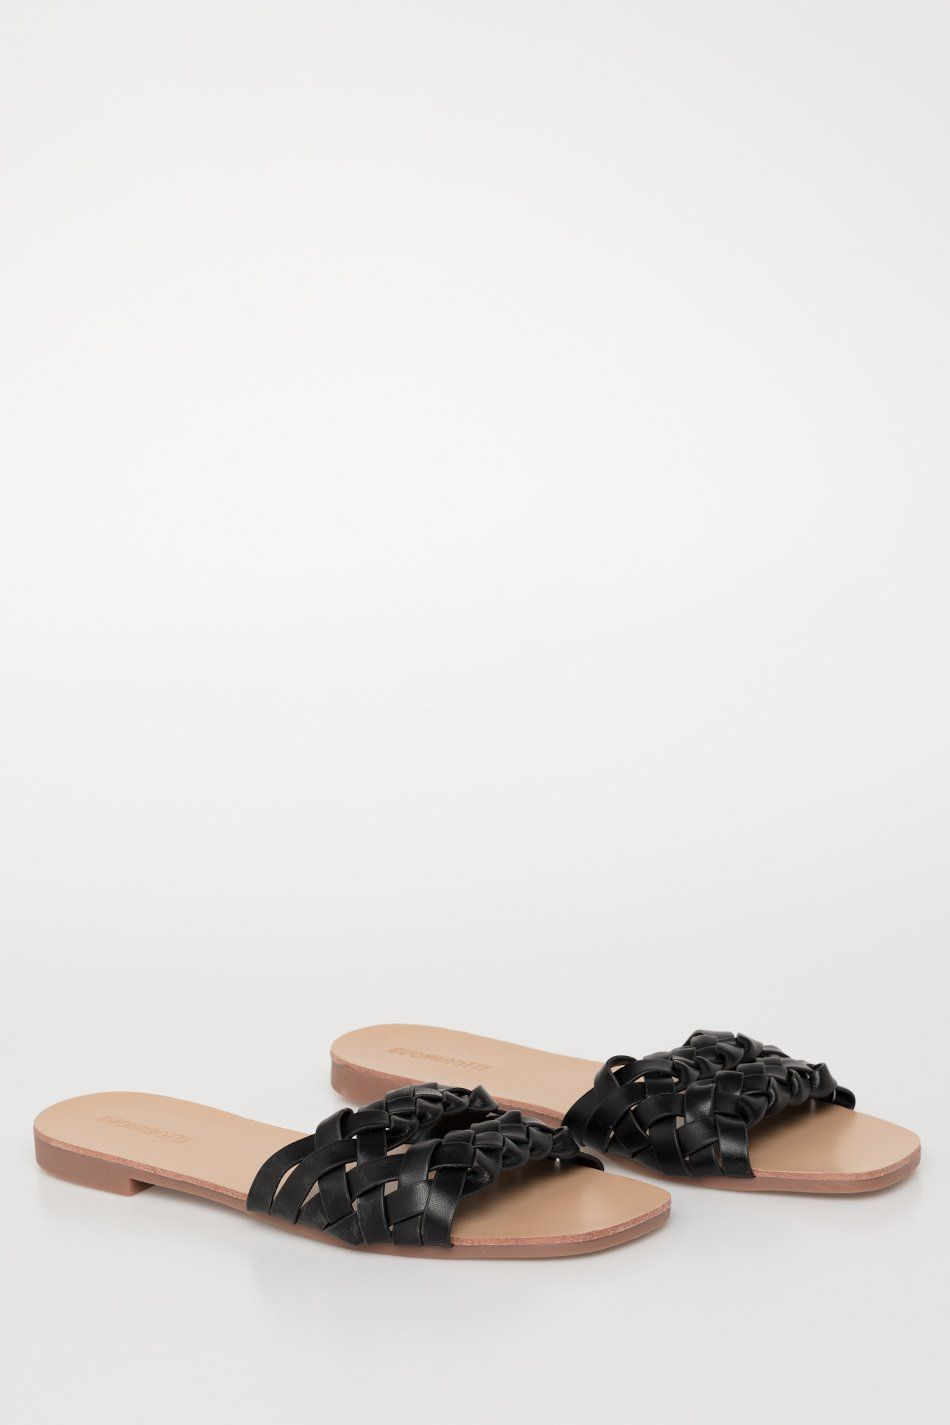 Sandalia plana pala trenzada negro